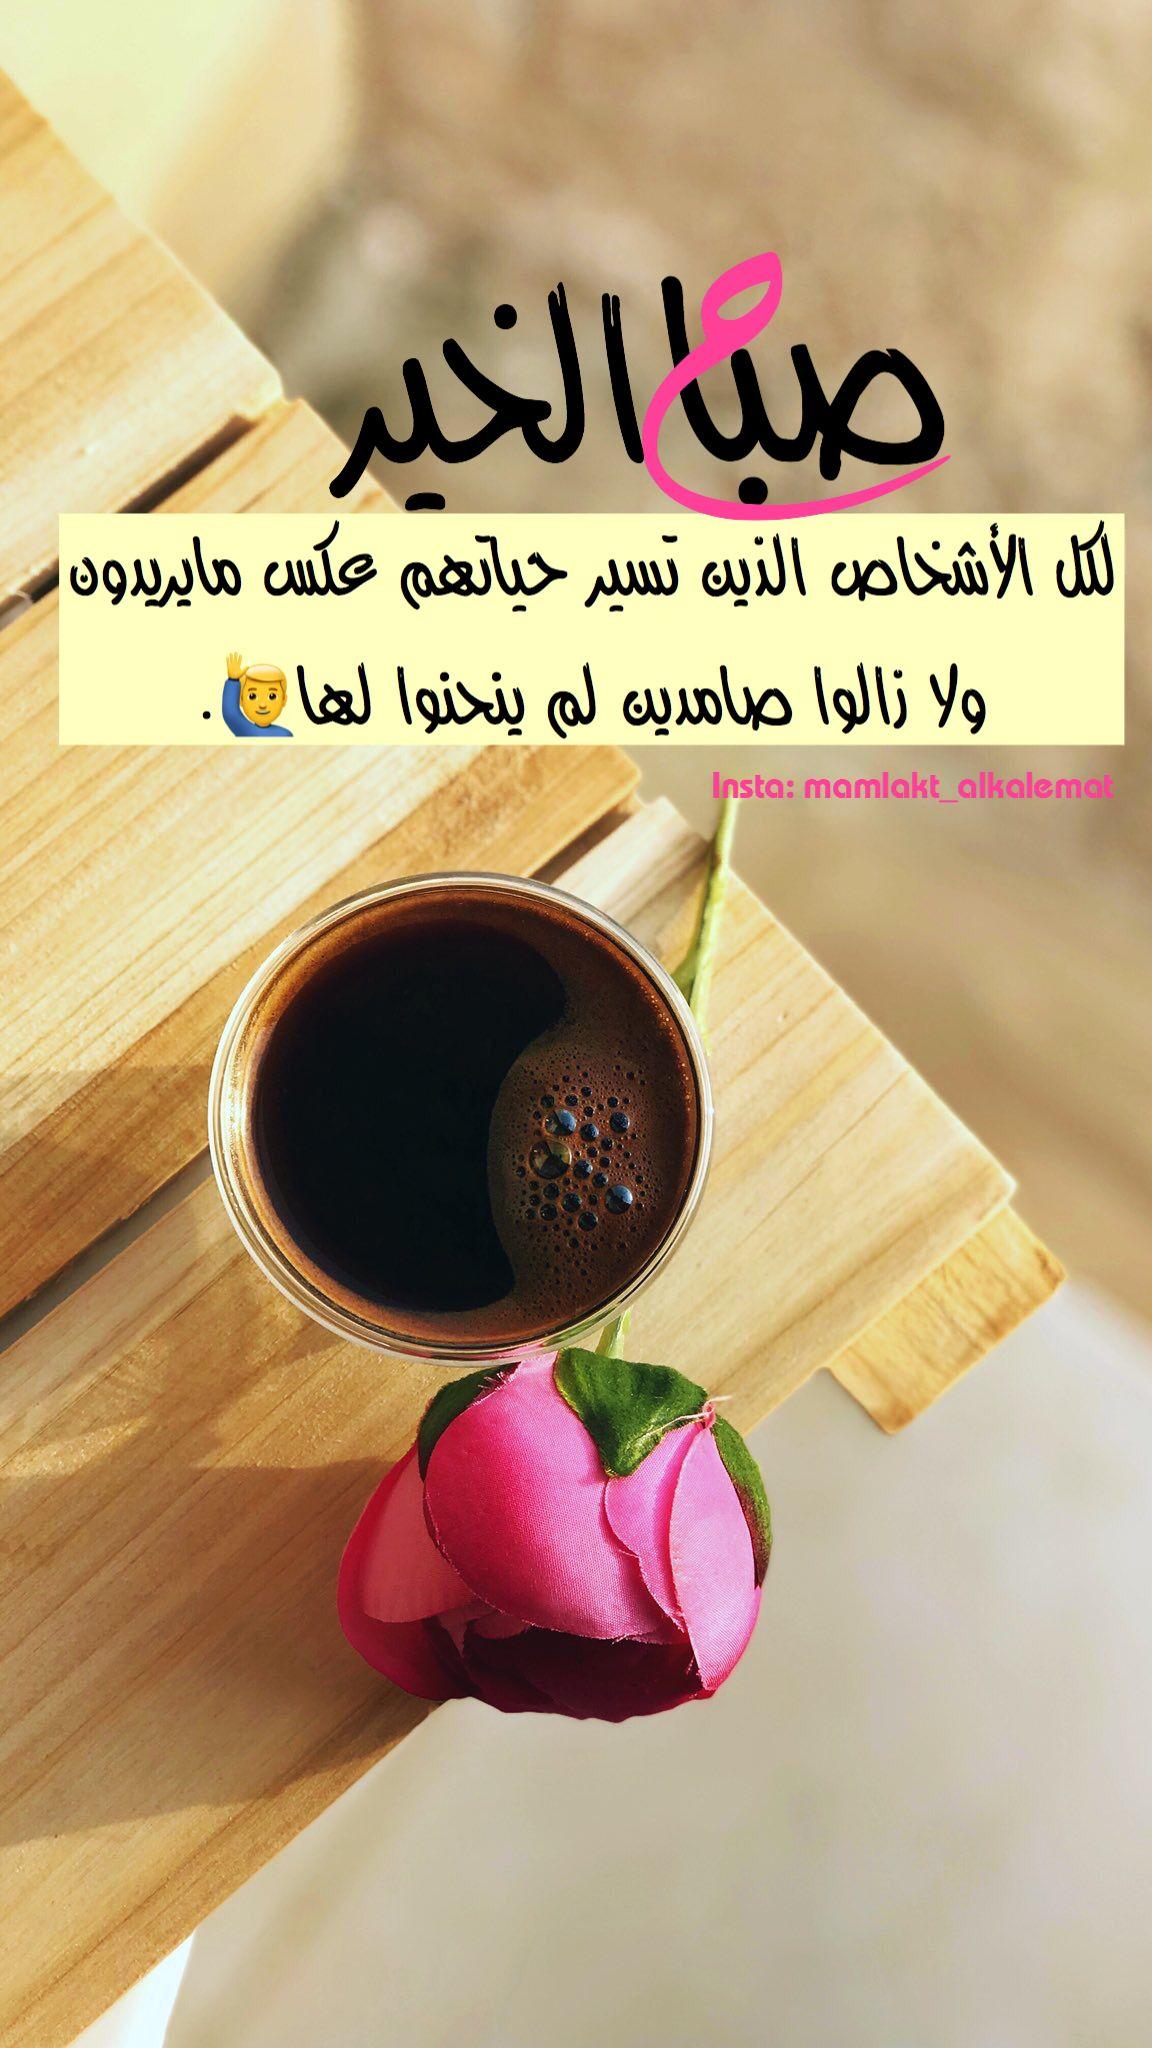 Pin By Aisha Khan On صباحيات Islamic Pictures Beautiful Morning Good Morning